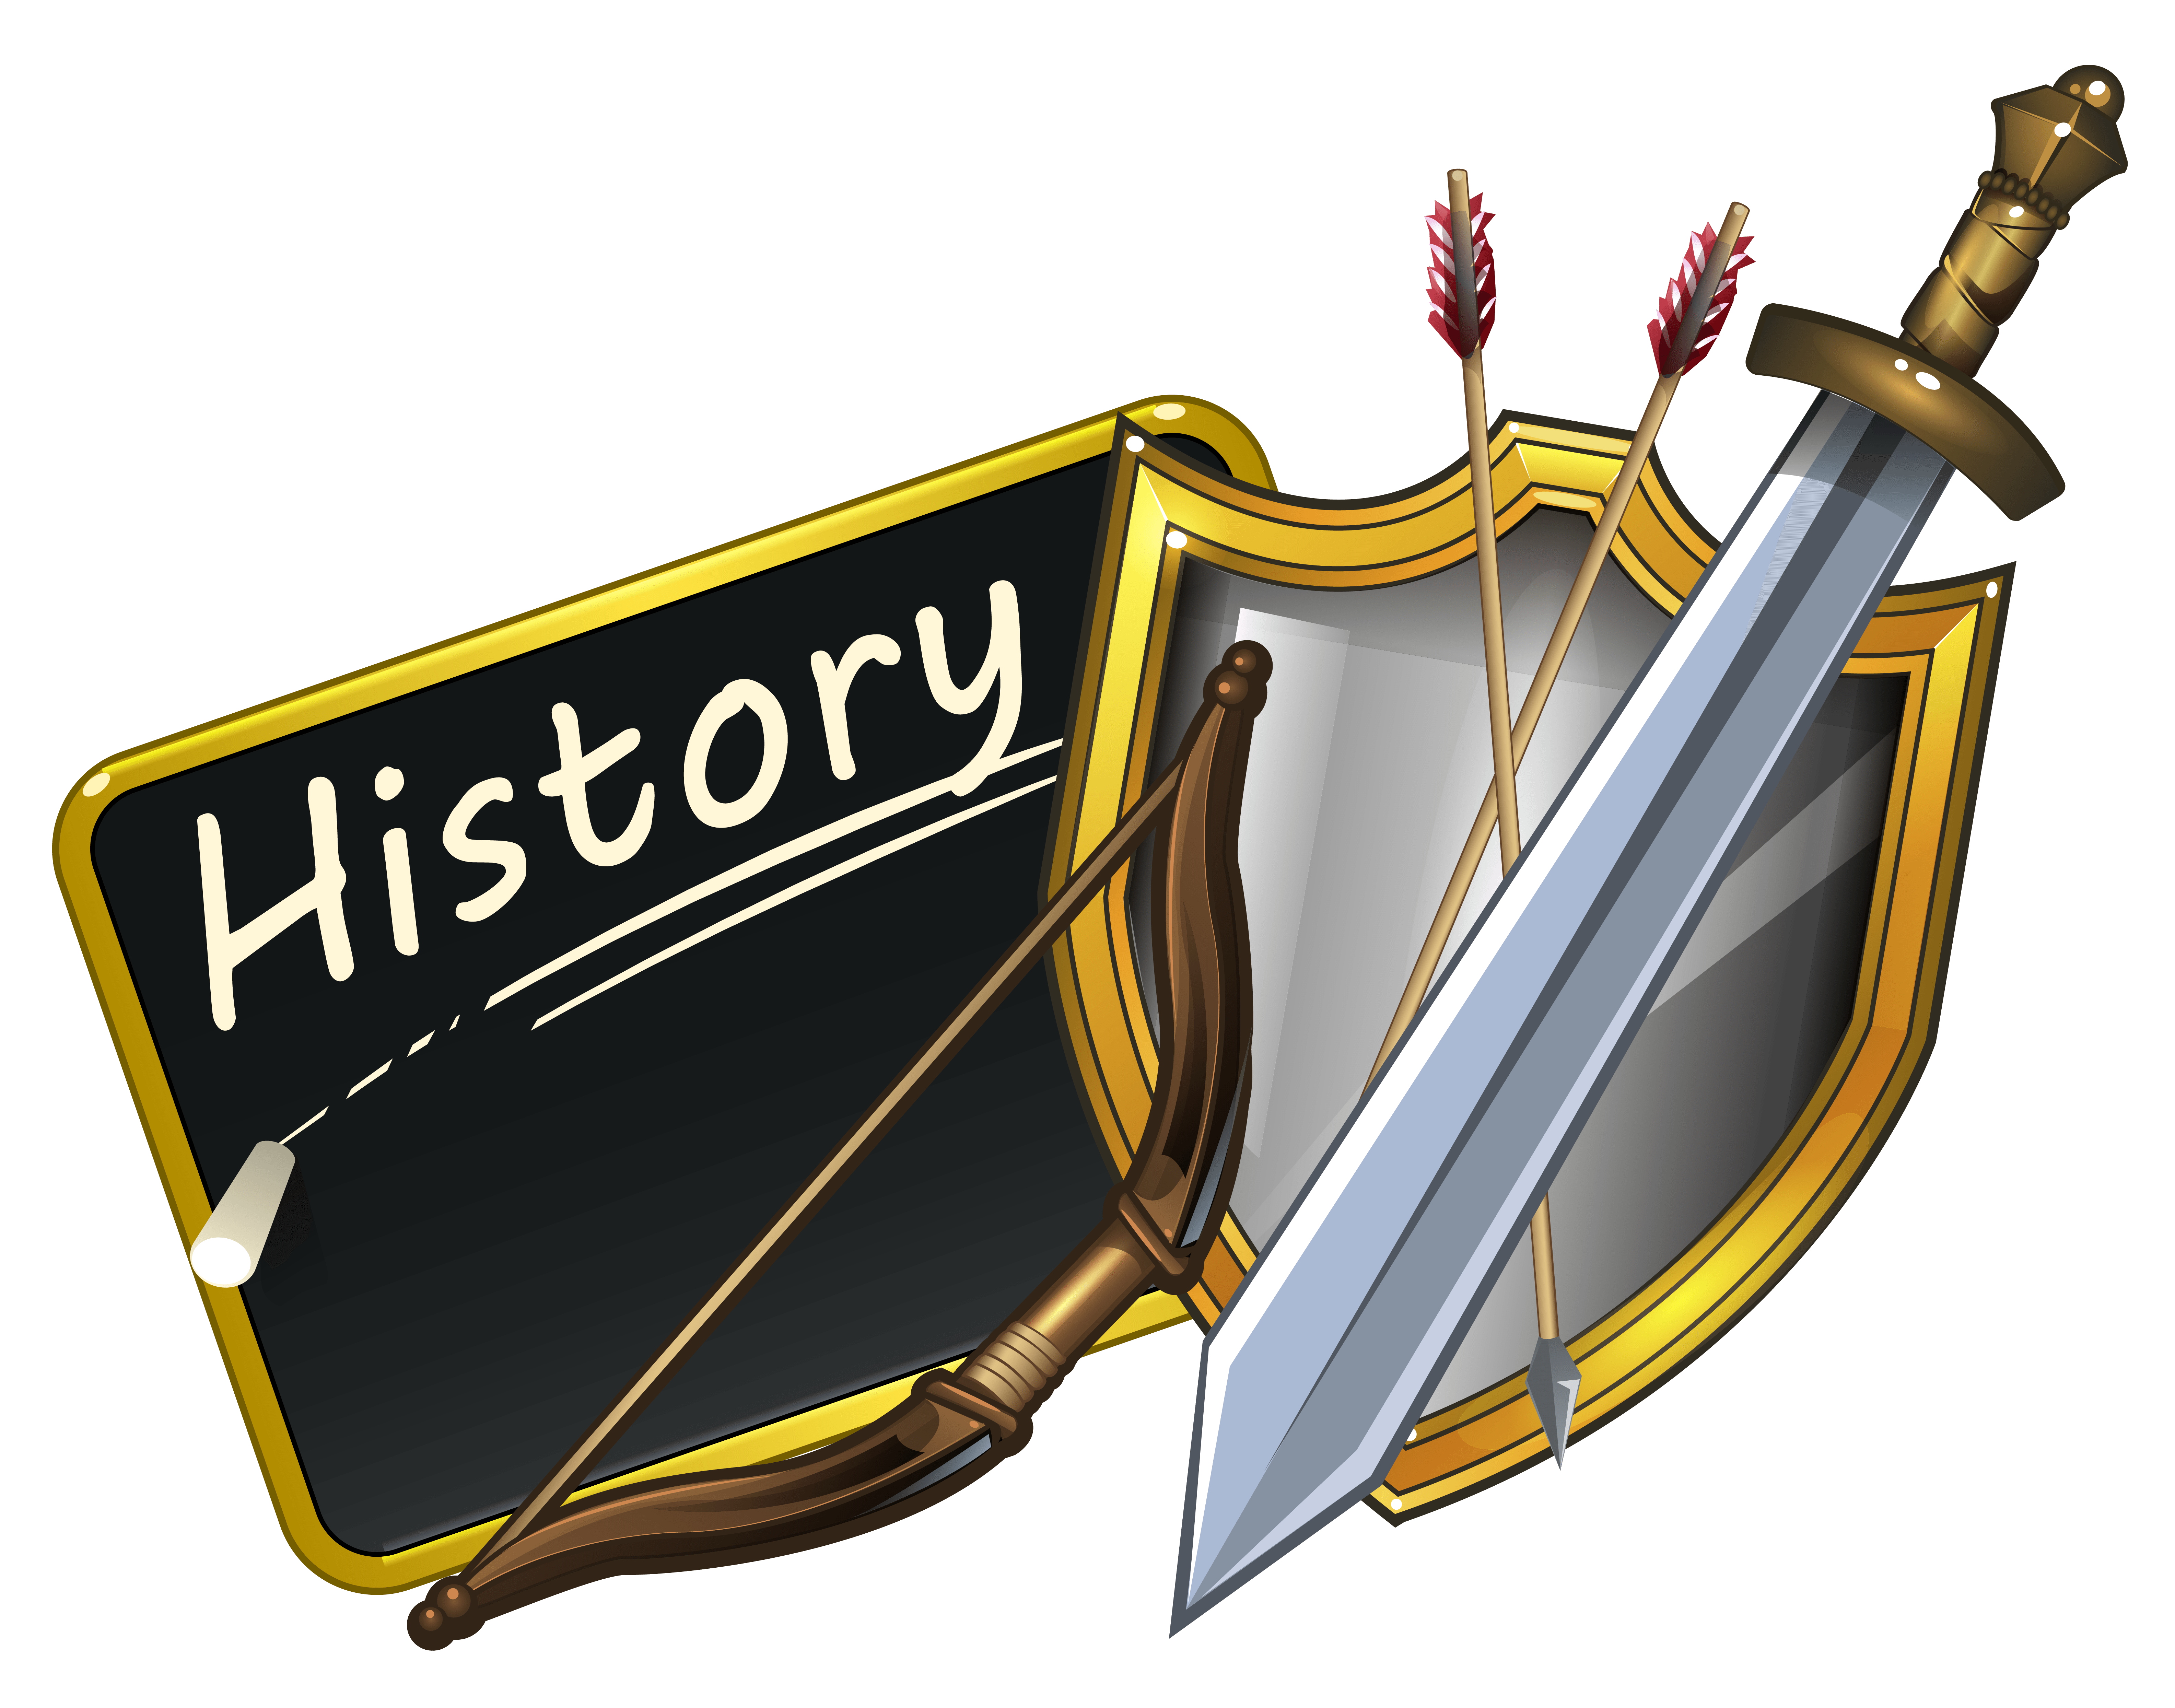 6339x4978 History Borders Cliparts